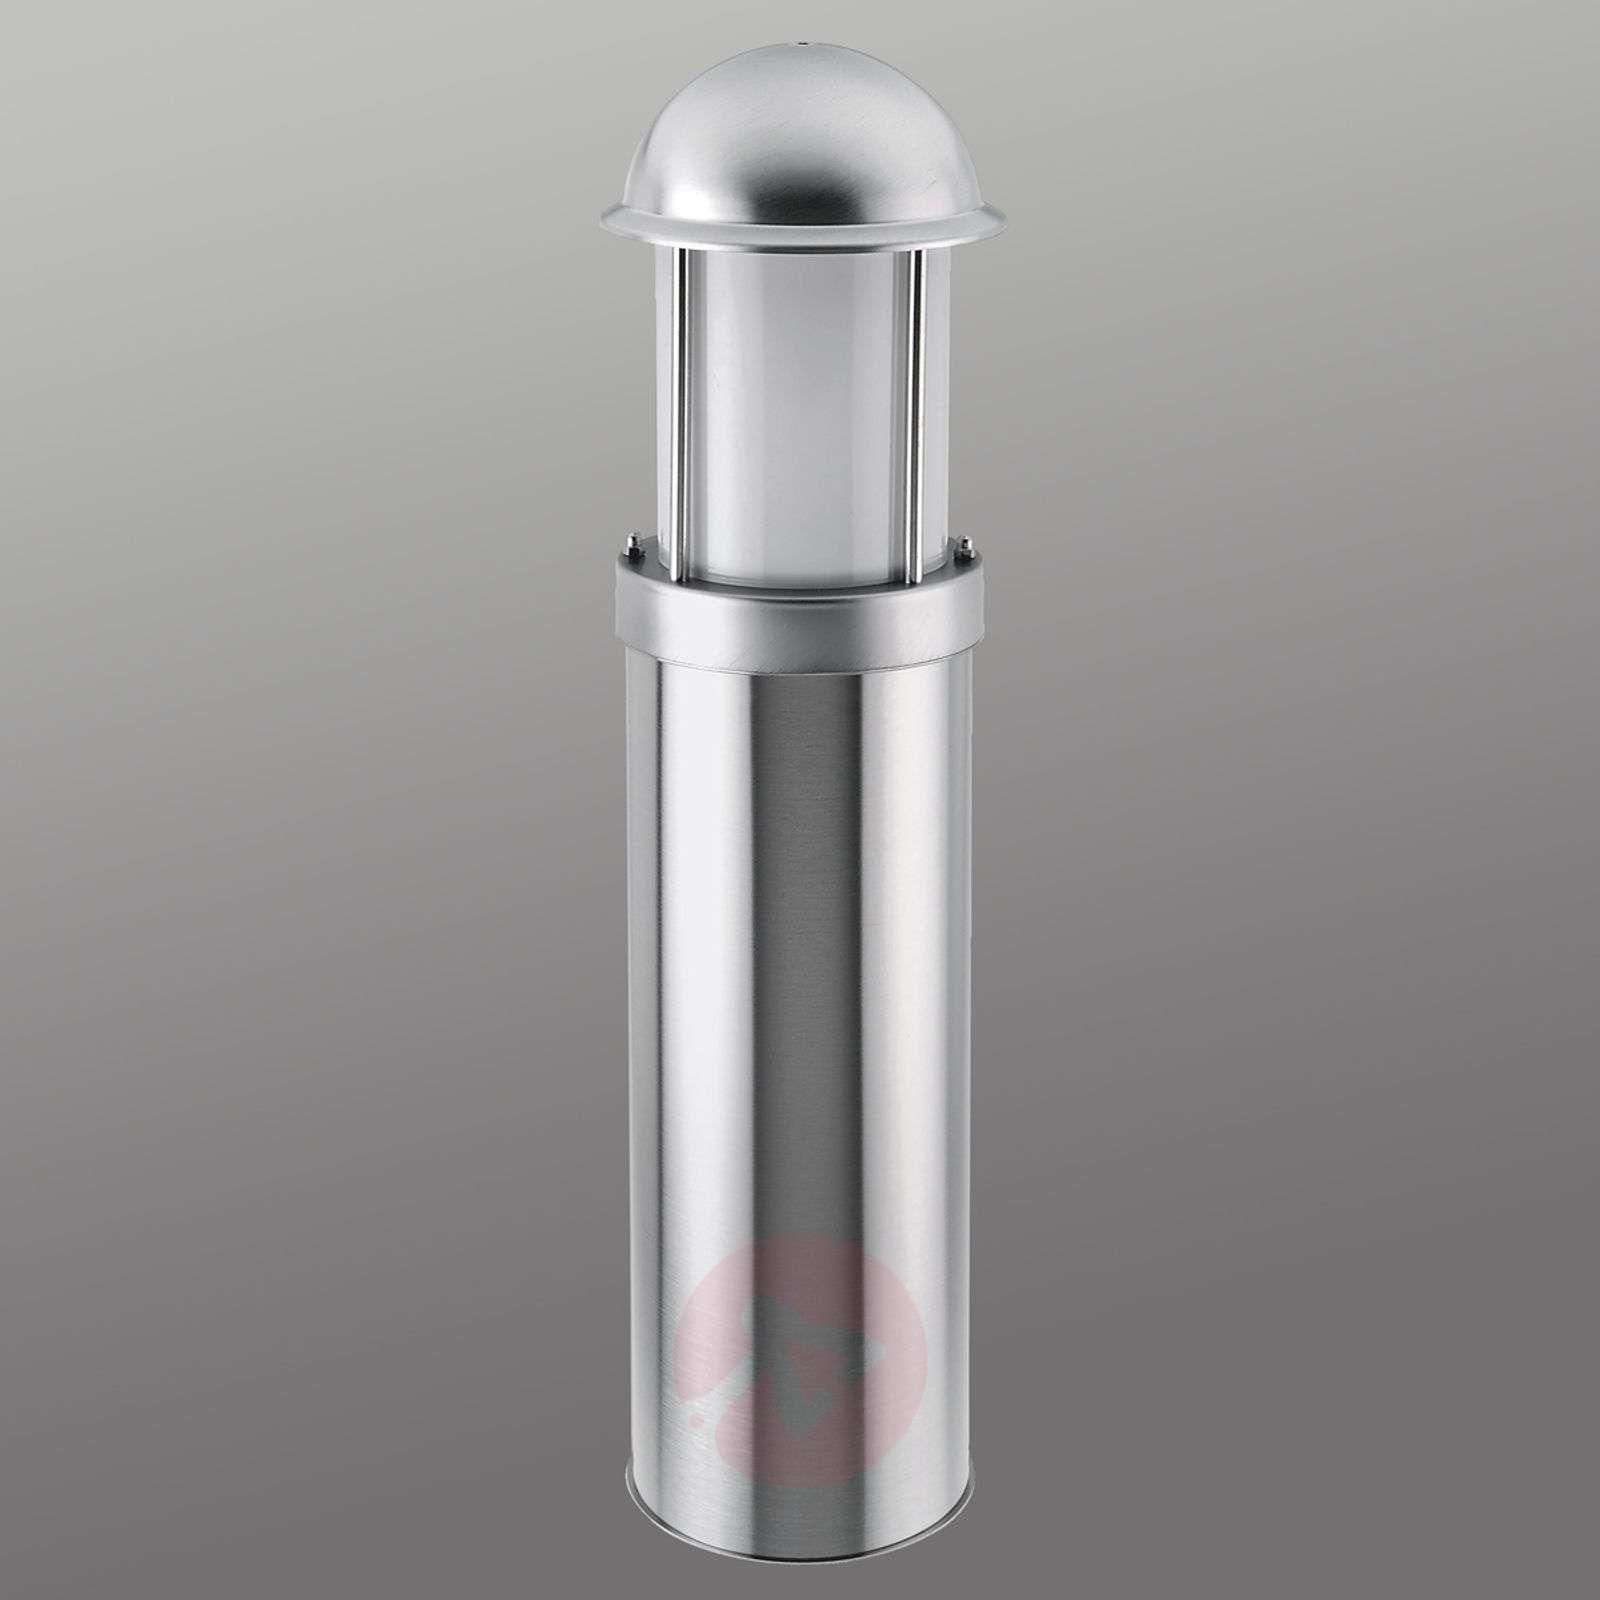 Bollard light Elena, seawater resistant-6068094-01